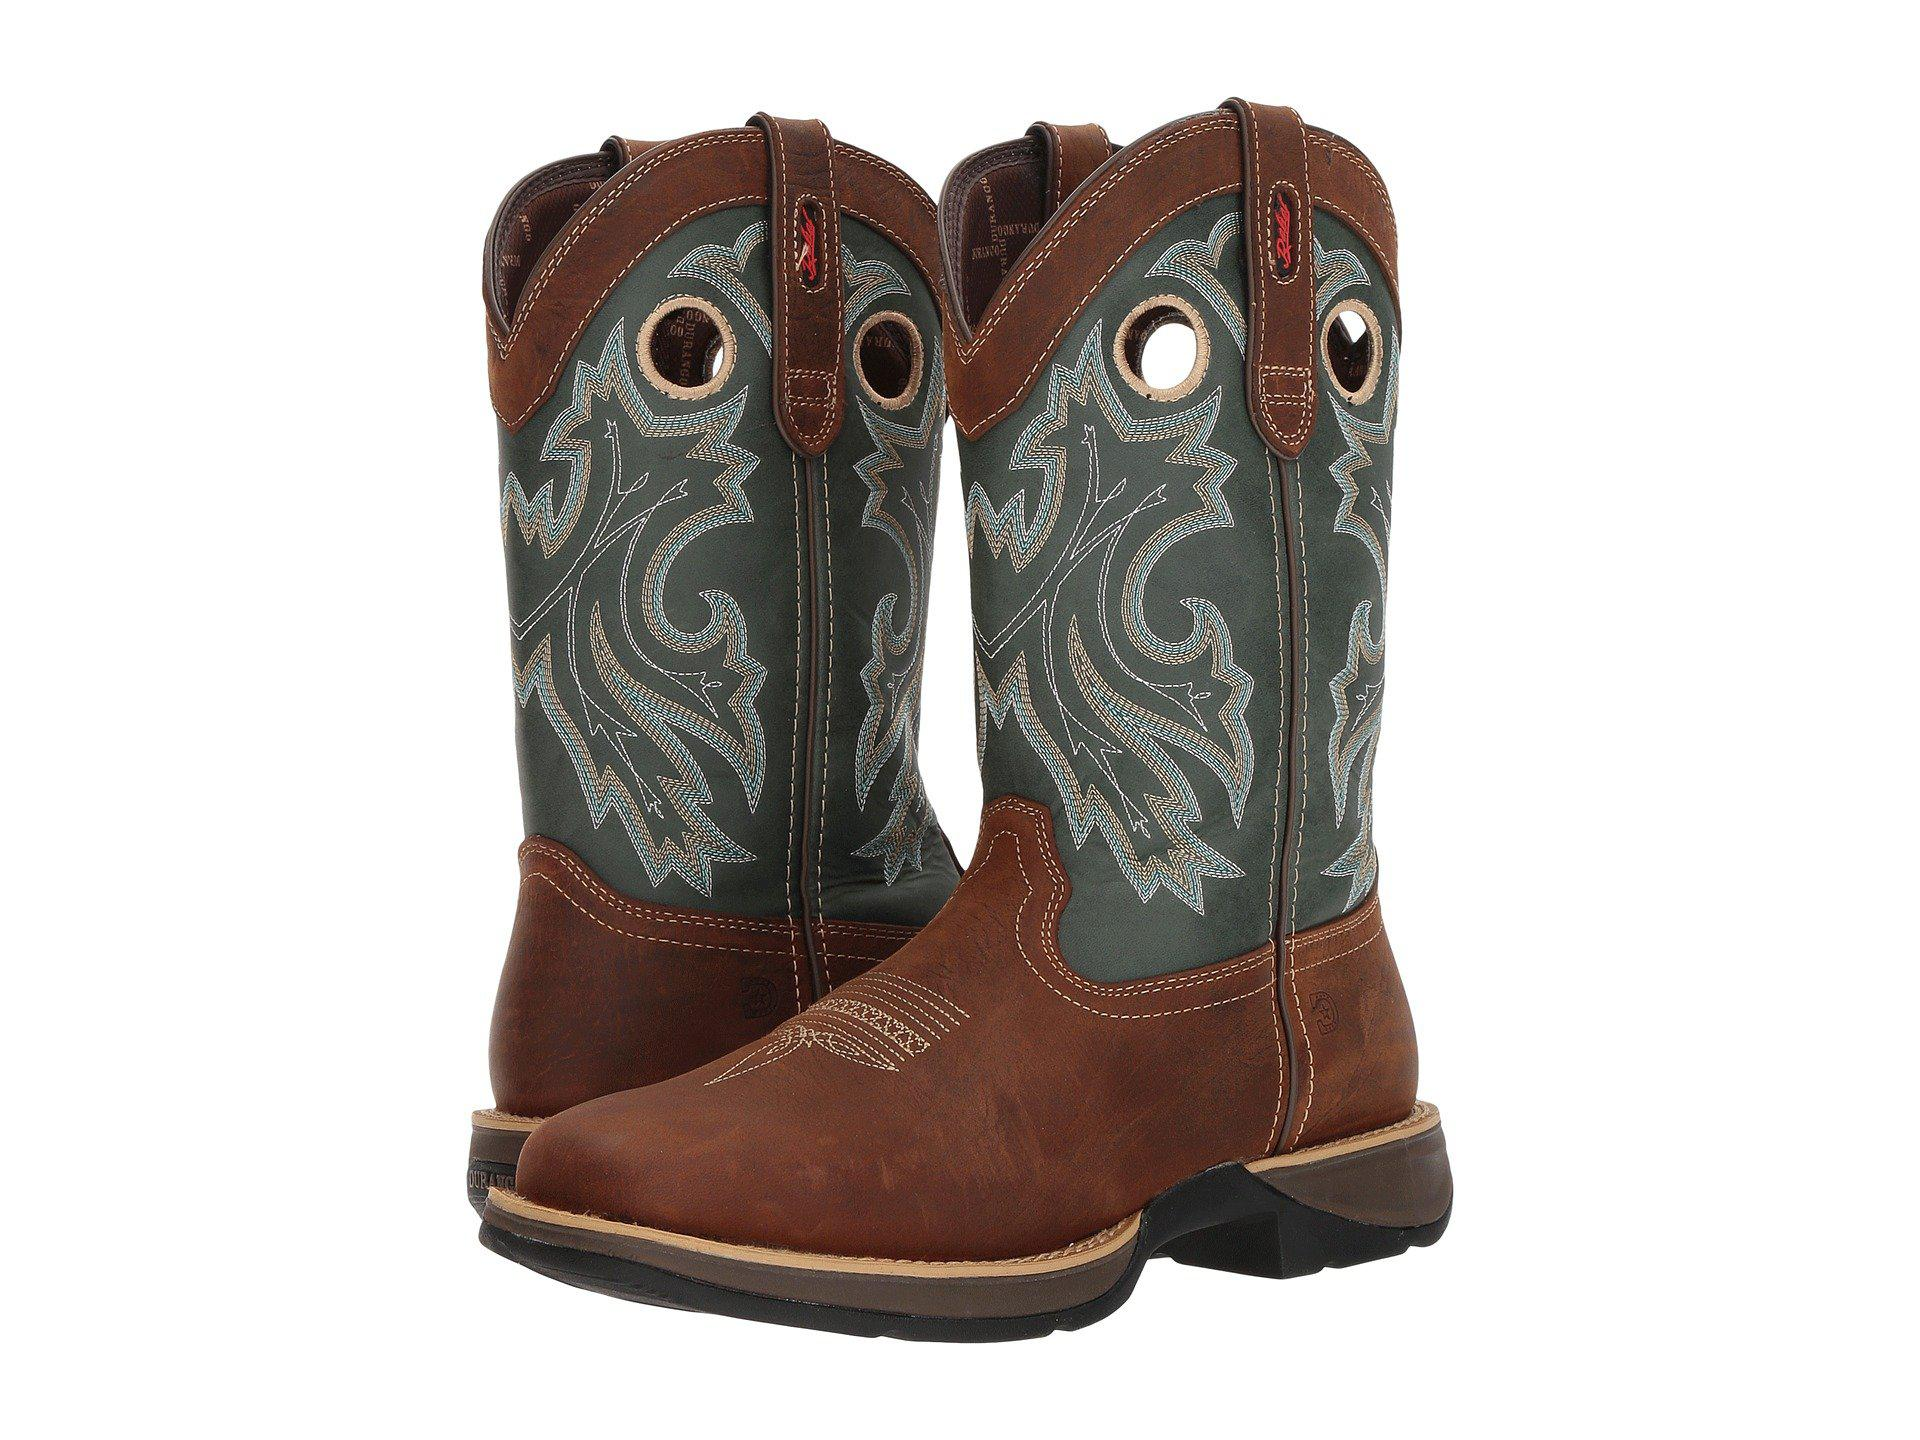 fdd295da609 Durango Brown Rebel By Steel Toe Pull-on Western Boot for men